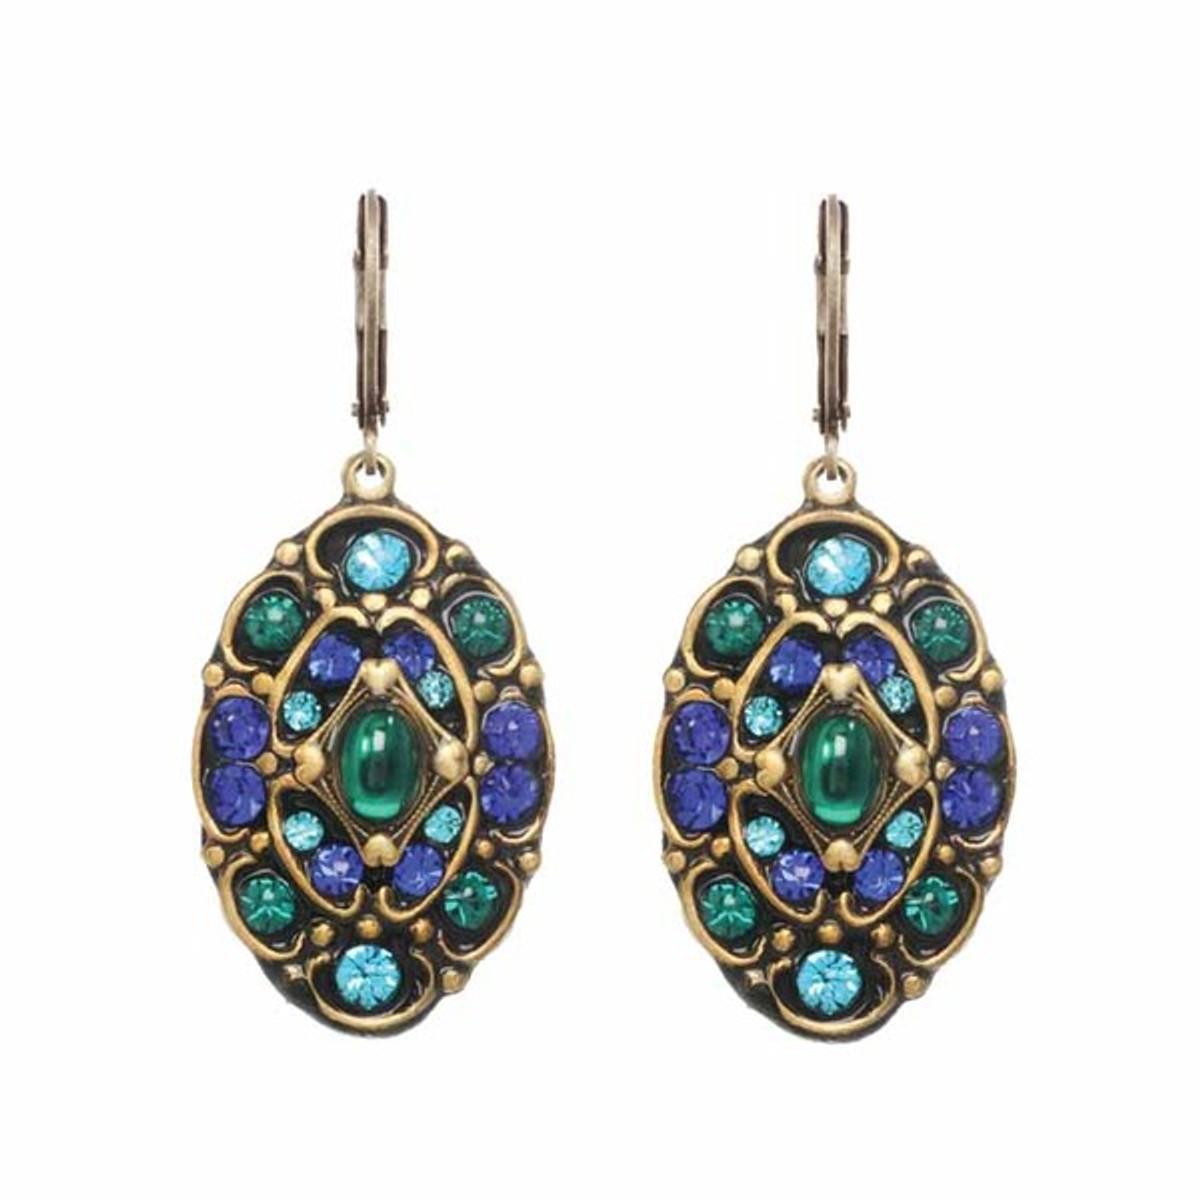 Michal Golan Jewelry Peacocks Earrings